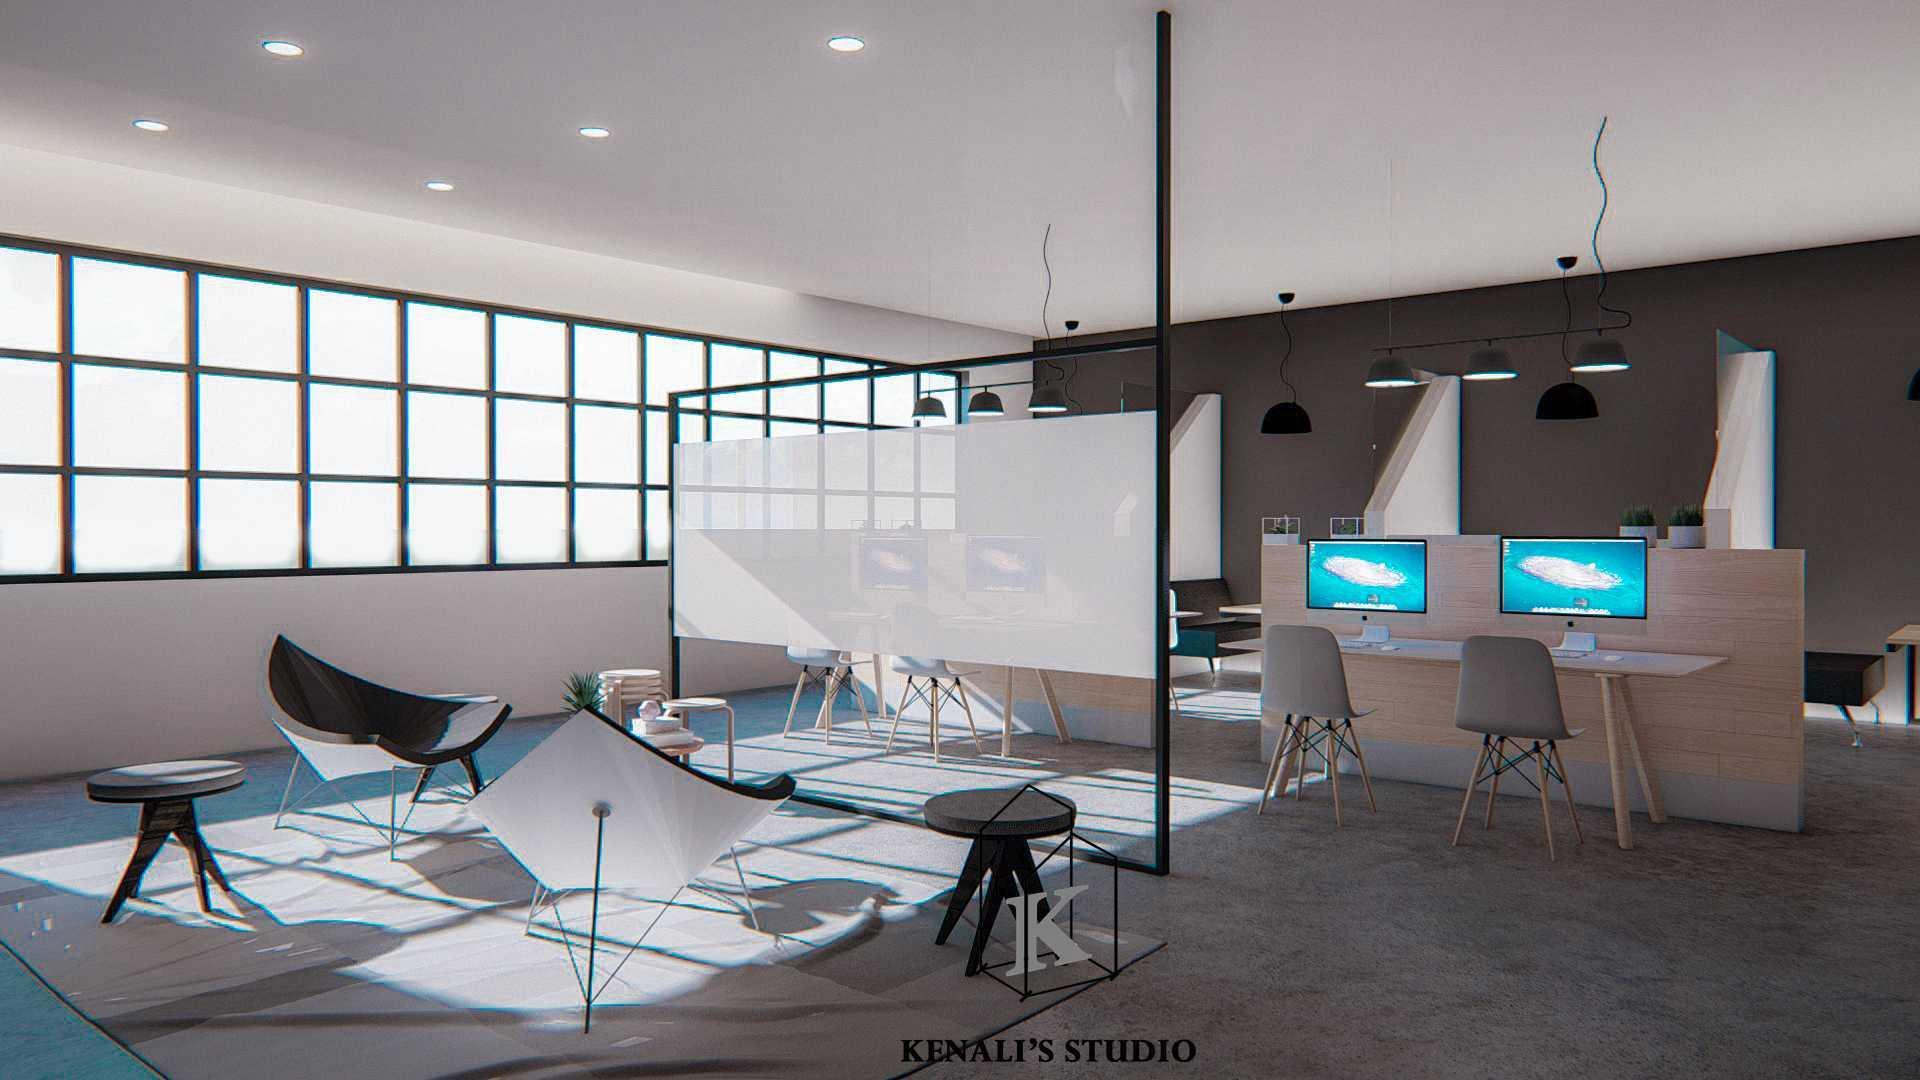 Kenali's Studio Co-Working Space Surabaya, Kota Sby, Jawa Timur, Indonesia Surabaya, Kota Sby, Jawa Timur, Indonesia Kenalis-Studio-Co-Working-Space  93660